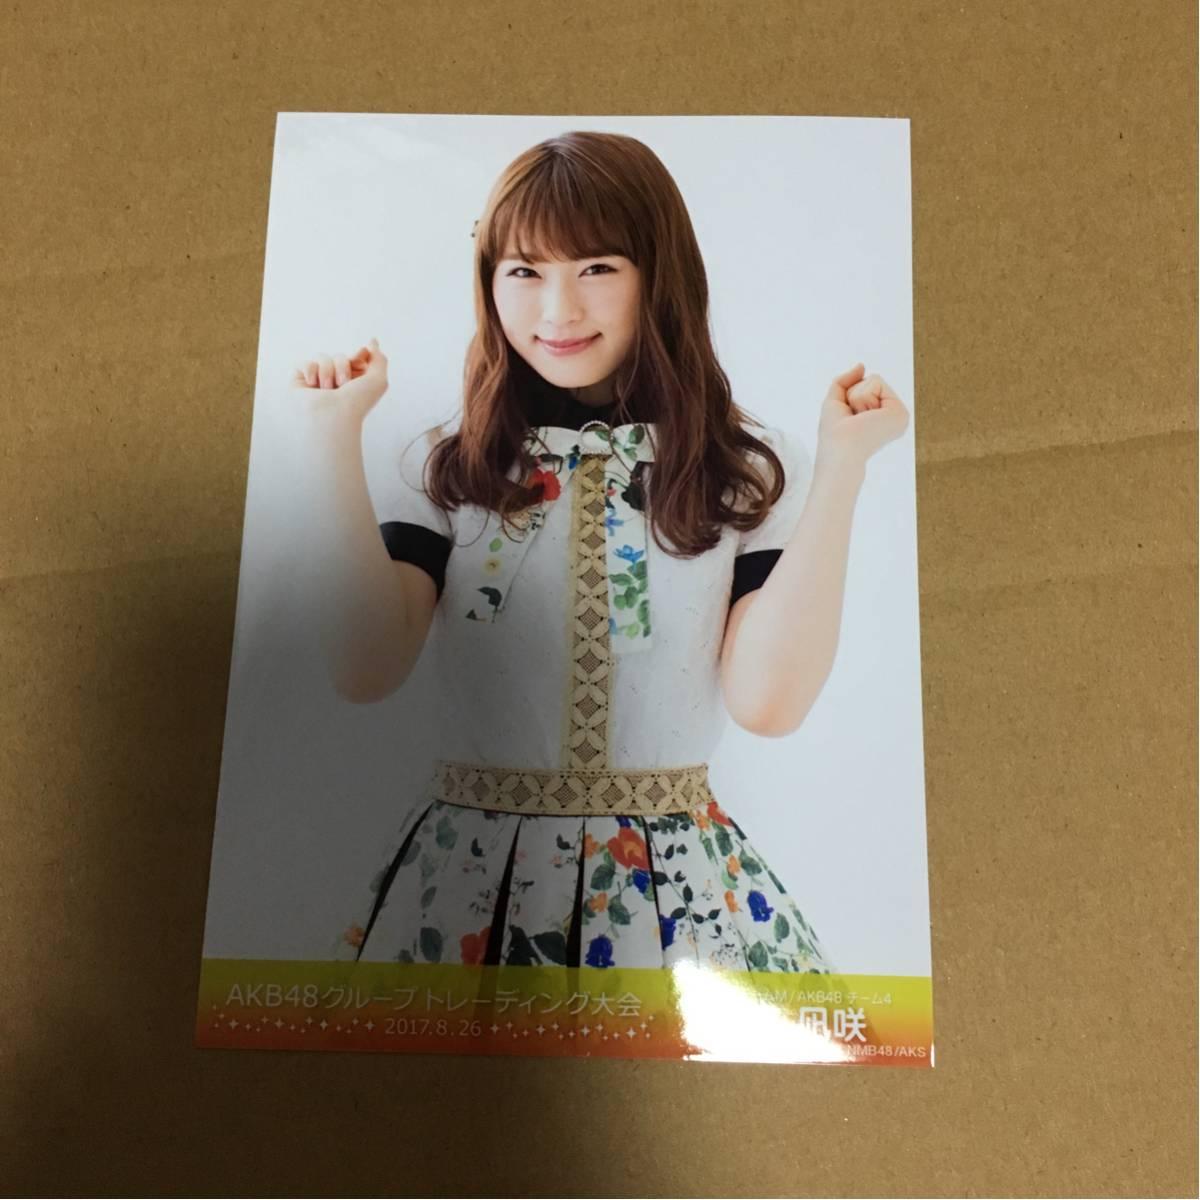 AKB48 グループ トレーディング大会 8月 NMB 渋谷凪咲 ライブ・総選挙グッズの画像